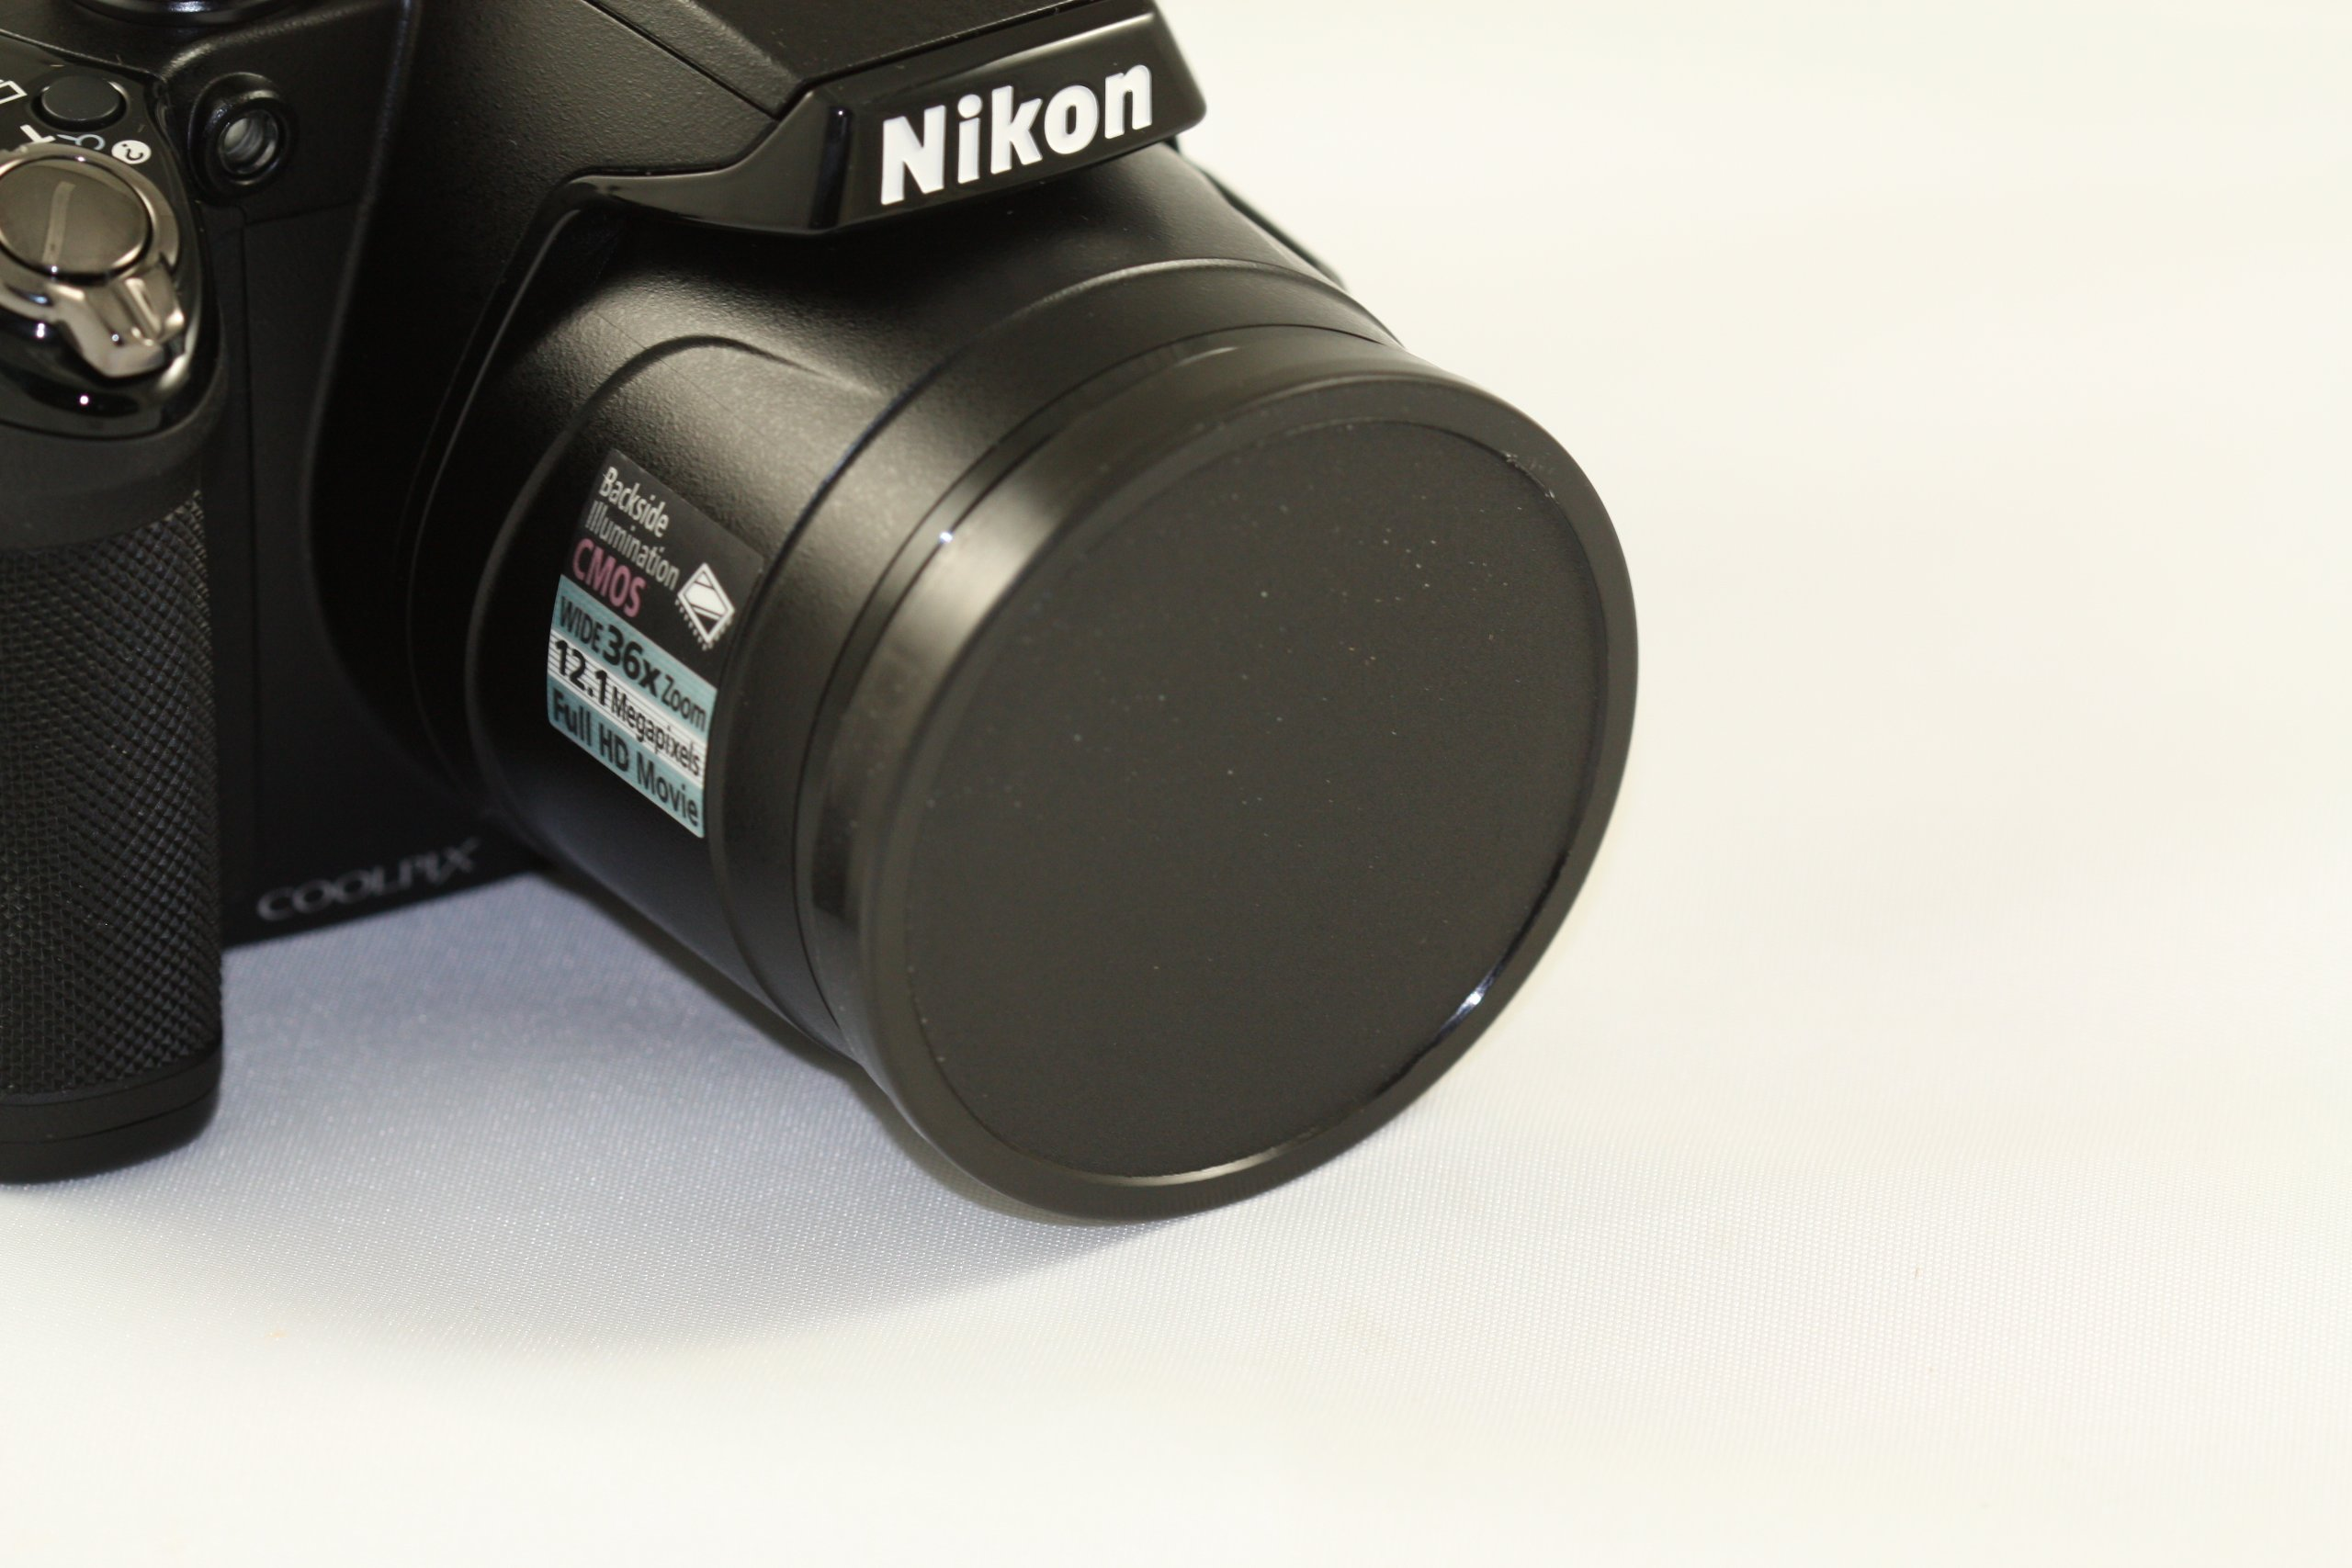 Push up Front Lens Cap Cover for Nikon Coolpix P500 , L110 , P80 Digital Camera + Cap Holder by A&R